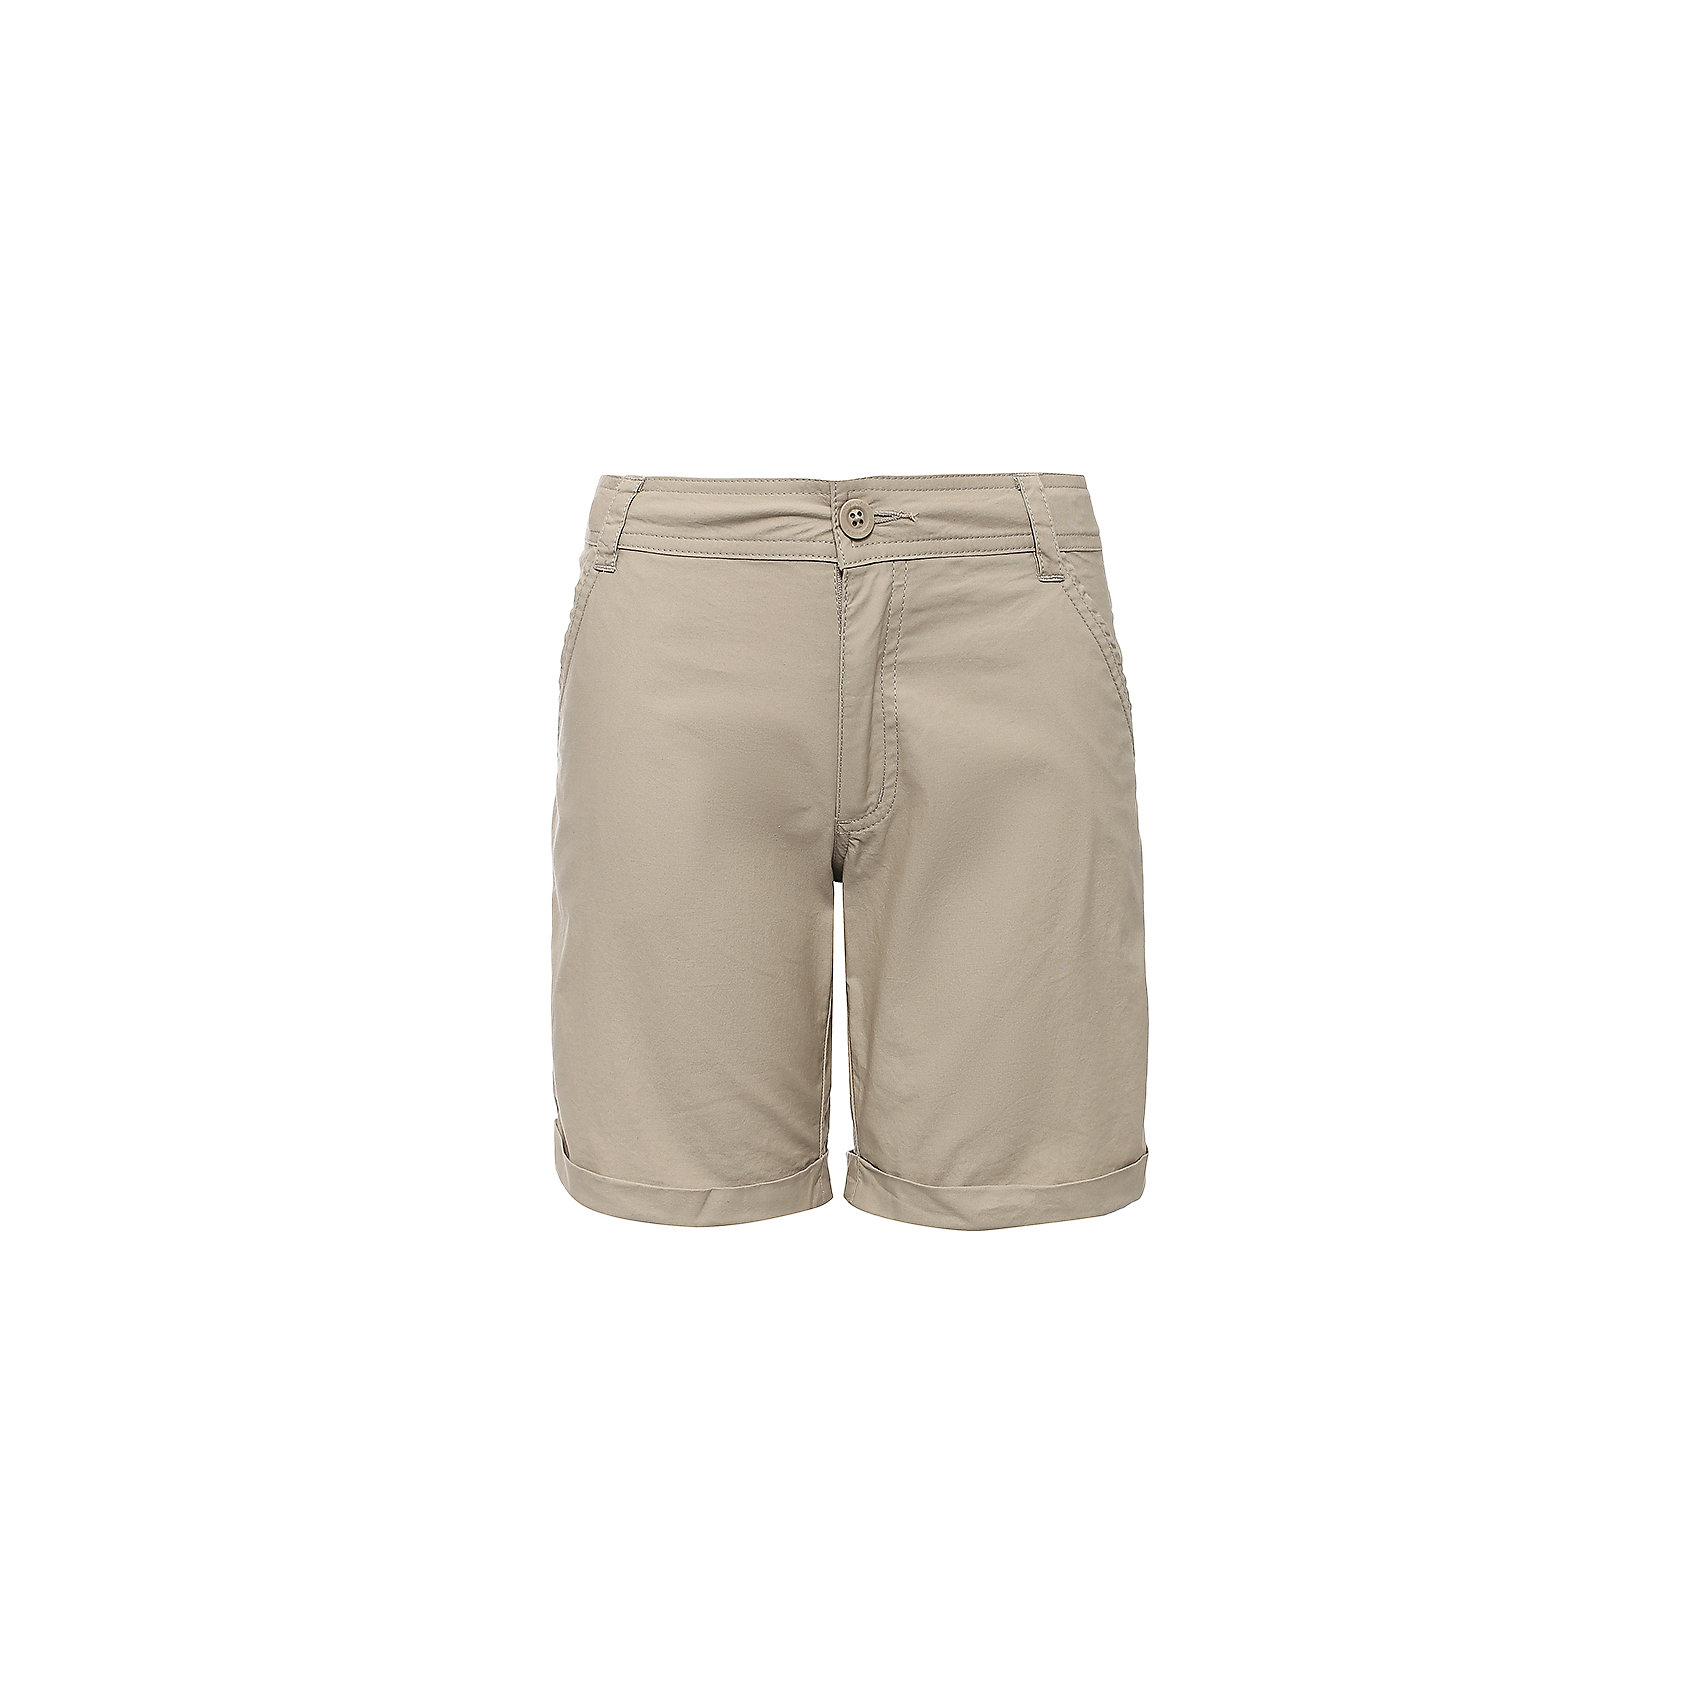 Шорты для мальчика Finn FlareШорты для мальчика от известного бренда Finn Flare<br>Фактура материала:Текстильный<br>Вид застежки:Молния<br> <br> Тип карманов:Втачные<br>Состав:<br>100% хлопок<br><br>Ширина мм: 191<br>Глубина мм: 10<br>Высота мм: 175<br>Вес г: 273<br>Цвет: серый<br>Возраст от месяцев: 144<br>Возраст до месяцев: 156<br>Пол: Мужской<br>Возраст: Детский<br>Размер: 158,110,146,134,122<br>SKU: 4835950